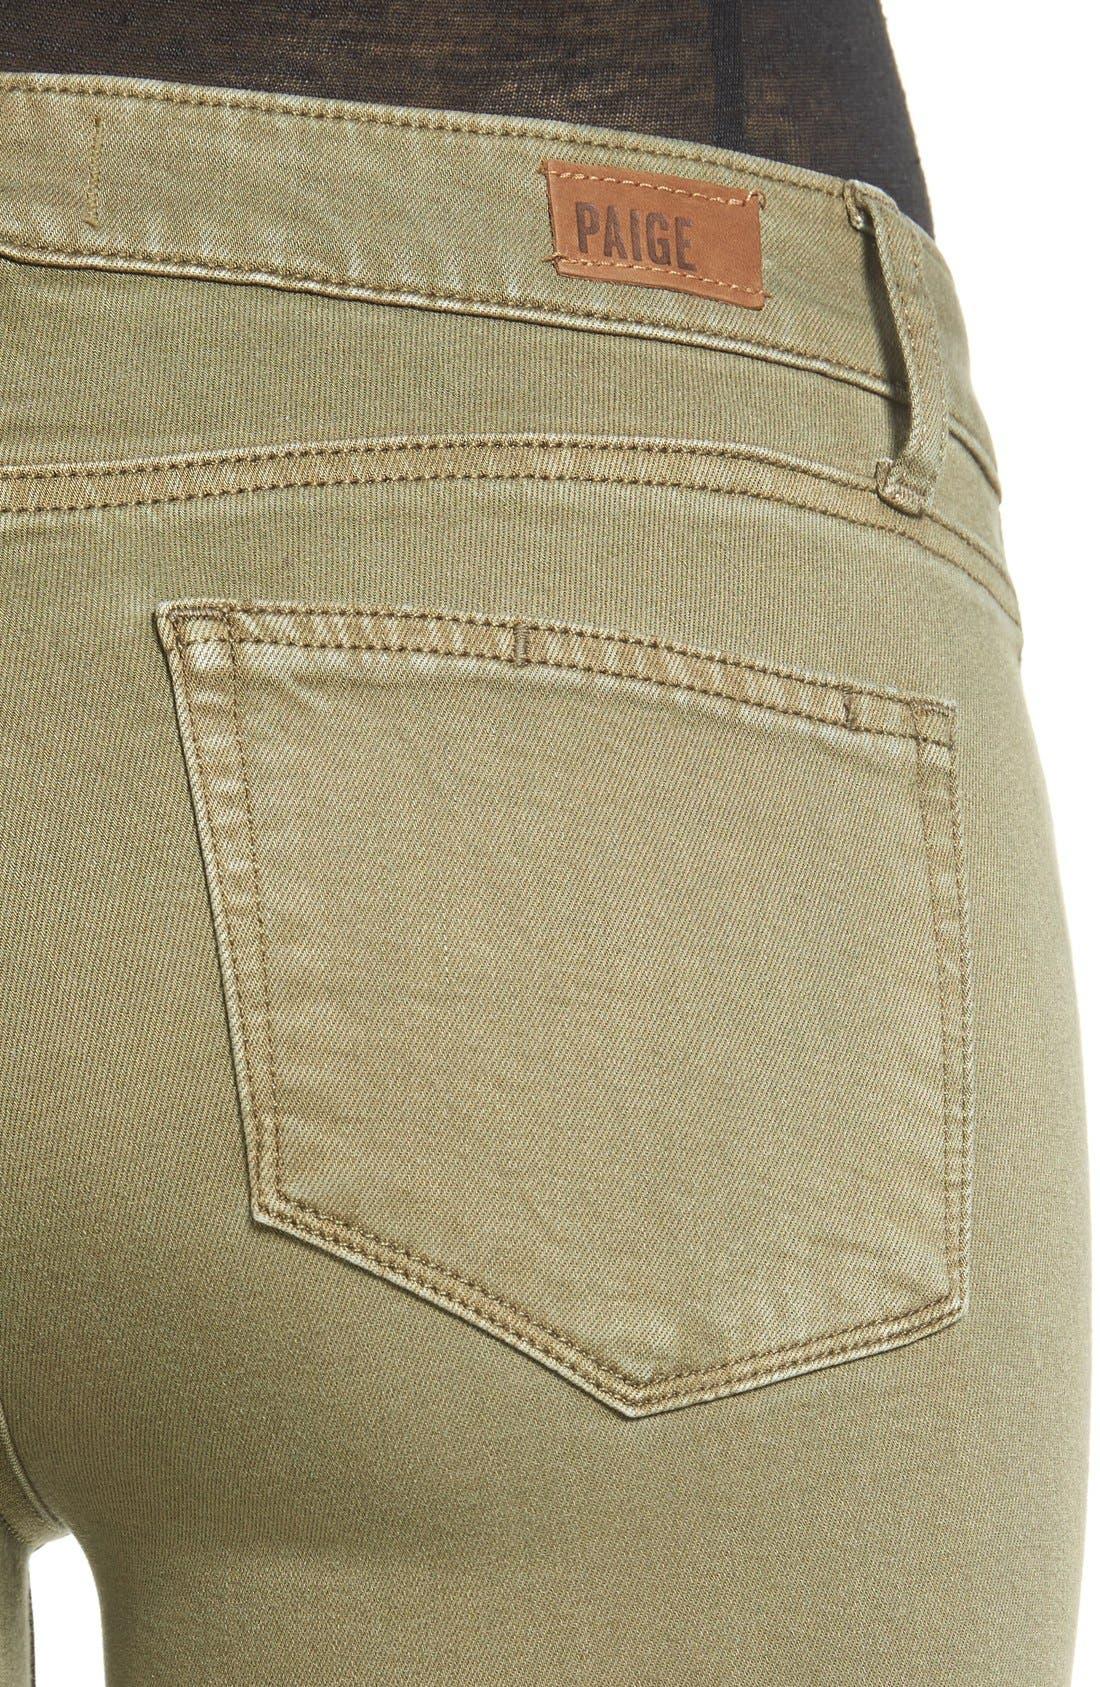 Transcend - Verdugo Ankle Skinny Jeans,                             Alternate thumbnail 5, color,                             300